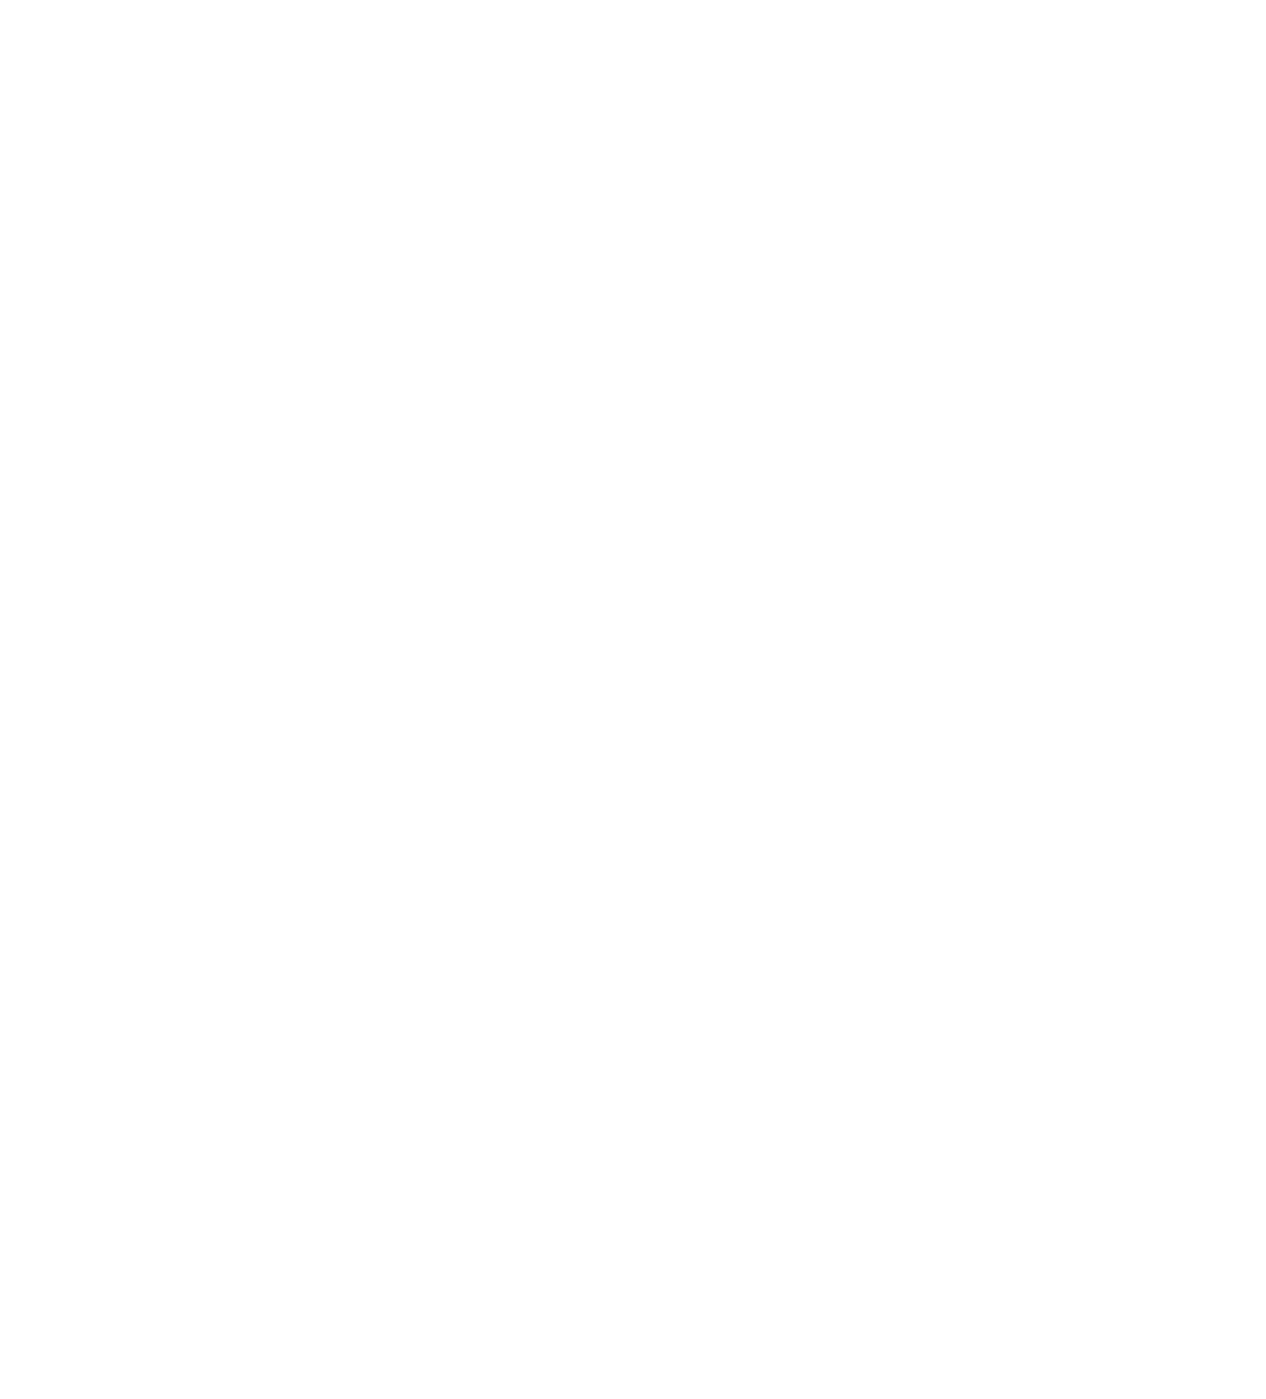 Panel Icon 4